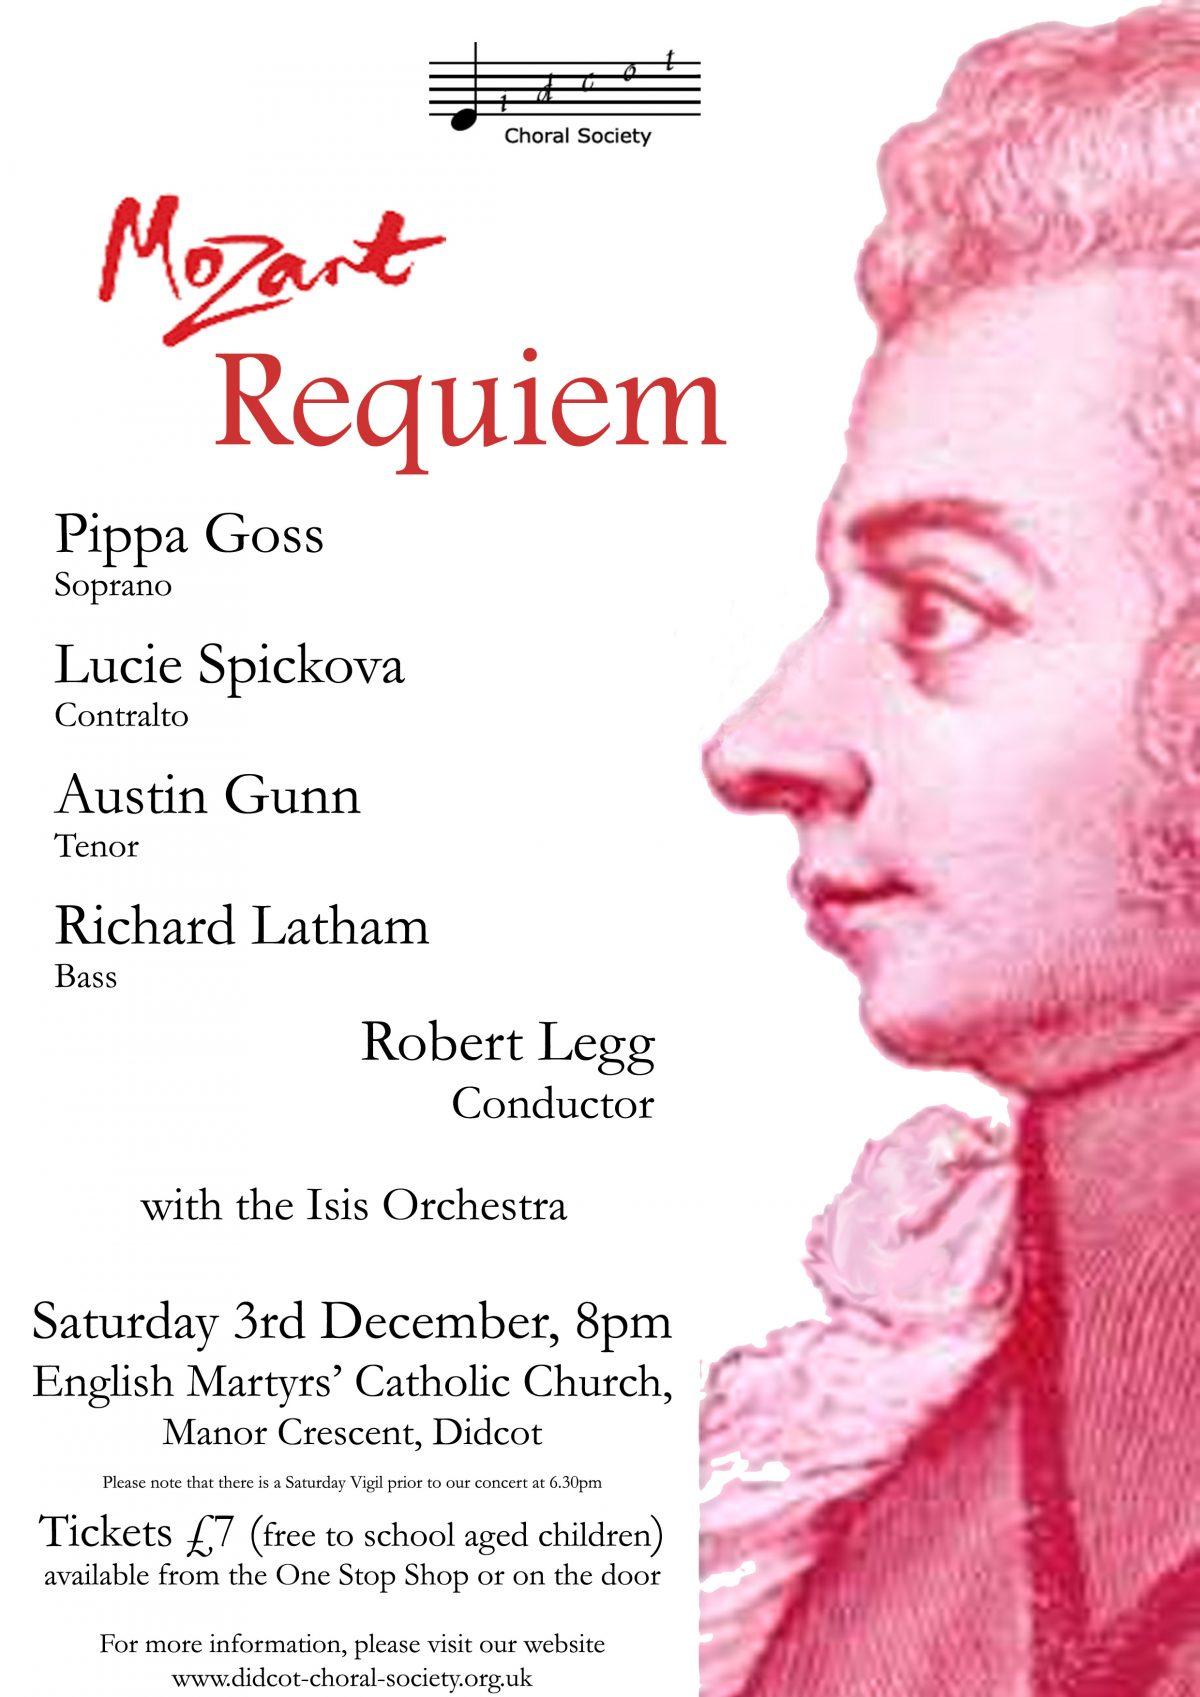 Mozart Requiem December 2005